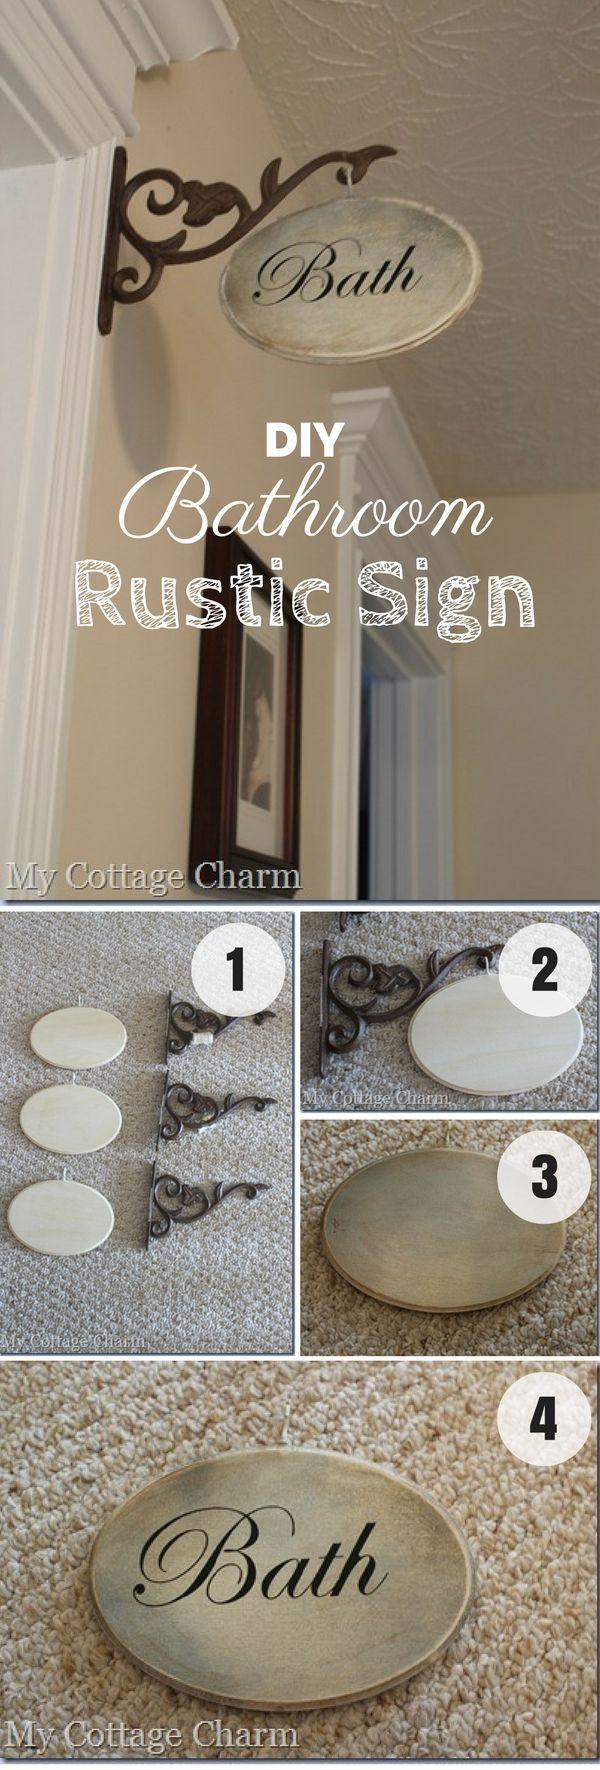 Easy to make DIY Rustic Bathroom Sign for rustic bathroom decor /istandarddesign/